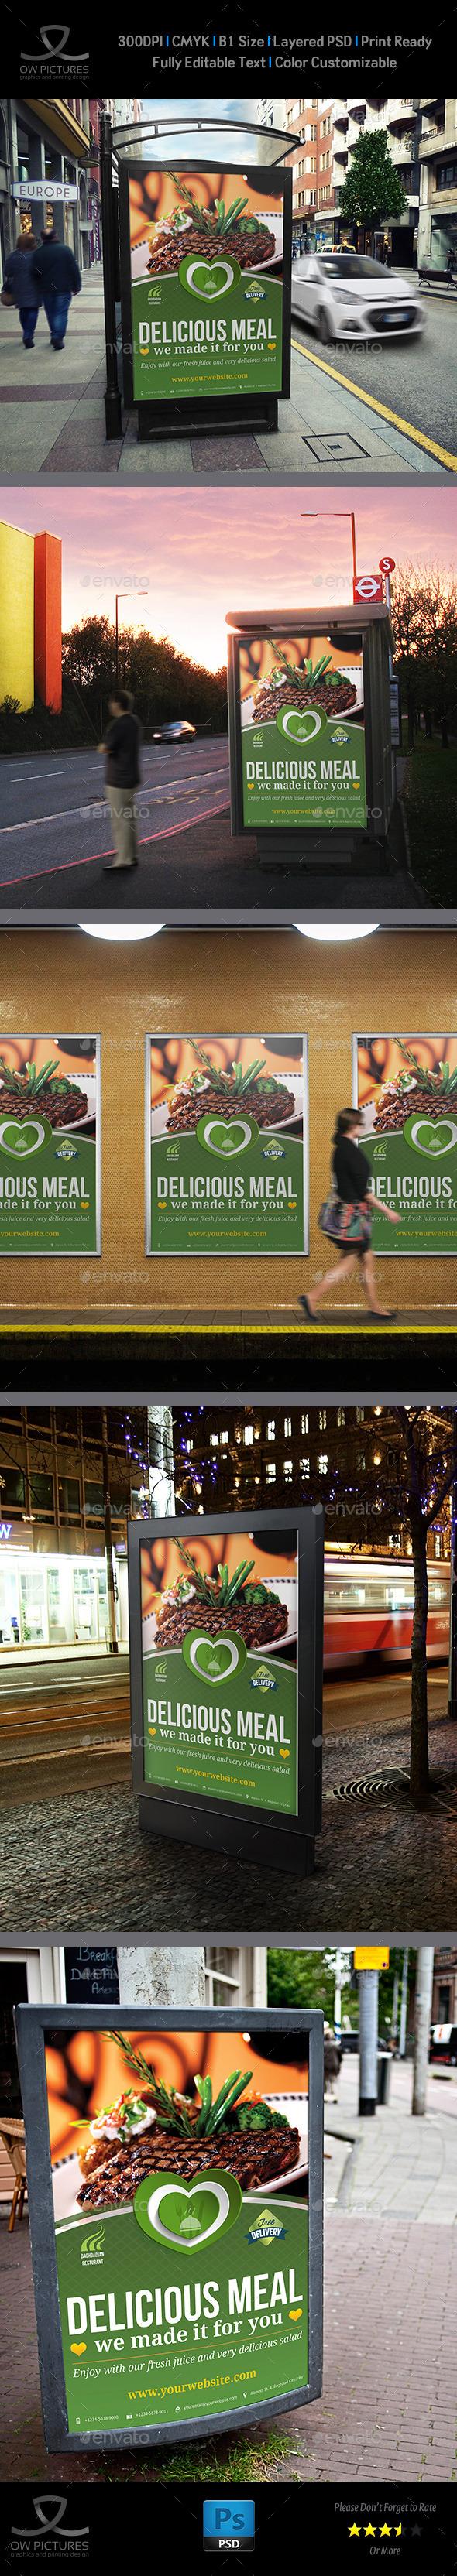 Restaurant Poster Template Vol.2 - Signage Print Templates